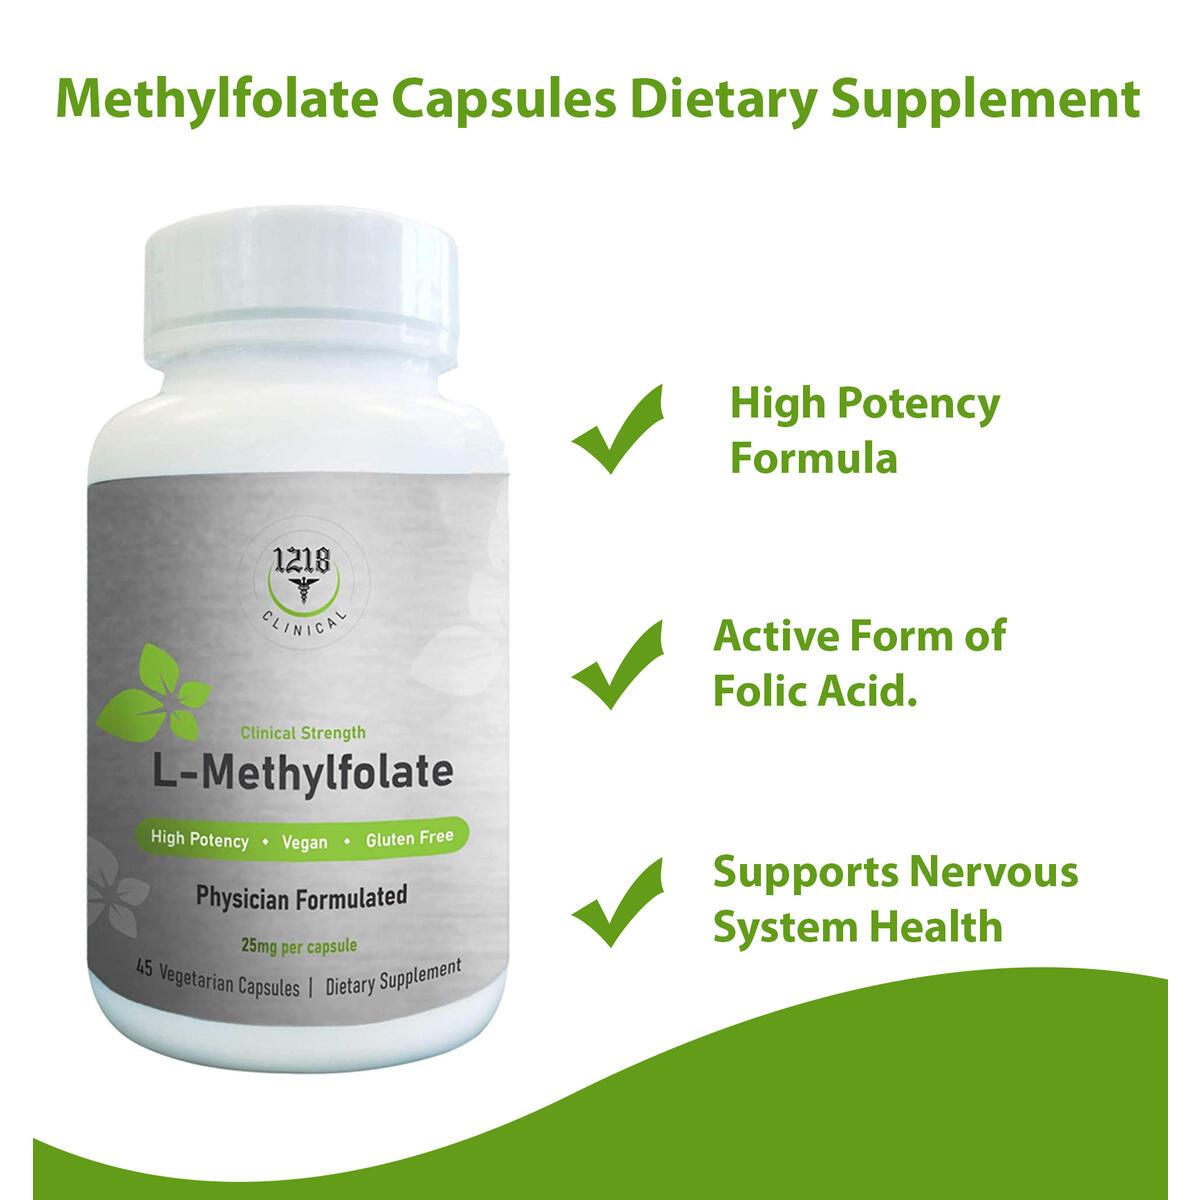 1218 L-Methylfolate Capsules Dietary Supplement - Organic High Potency Vitamin B Folate for Balanced Mood, Mental Alertness & Sleep - Boost Energy & Support Immune Health - 45 Pure Vegetarian Caps